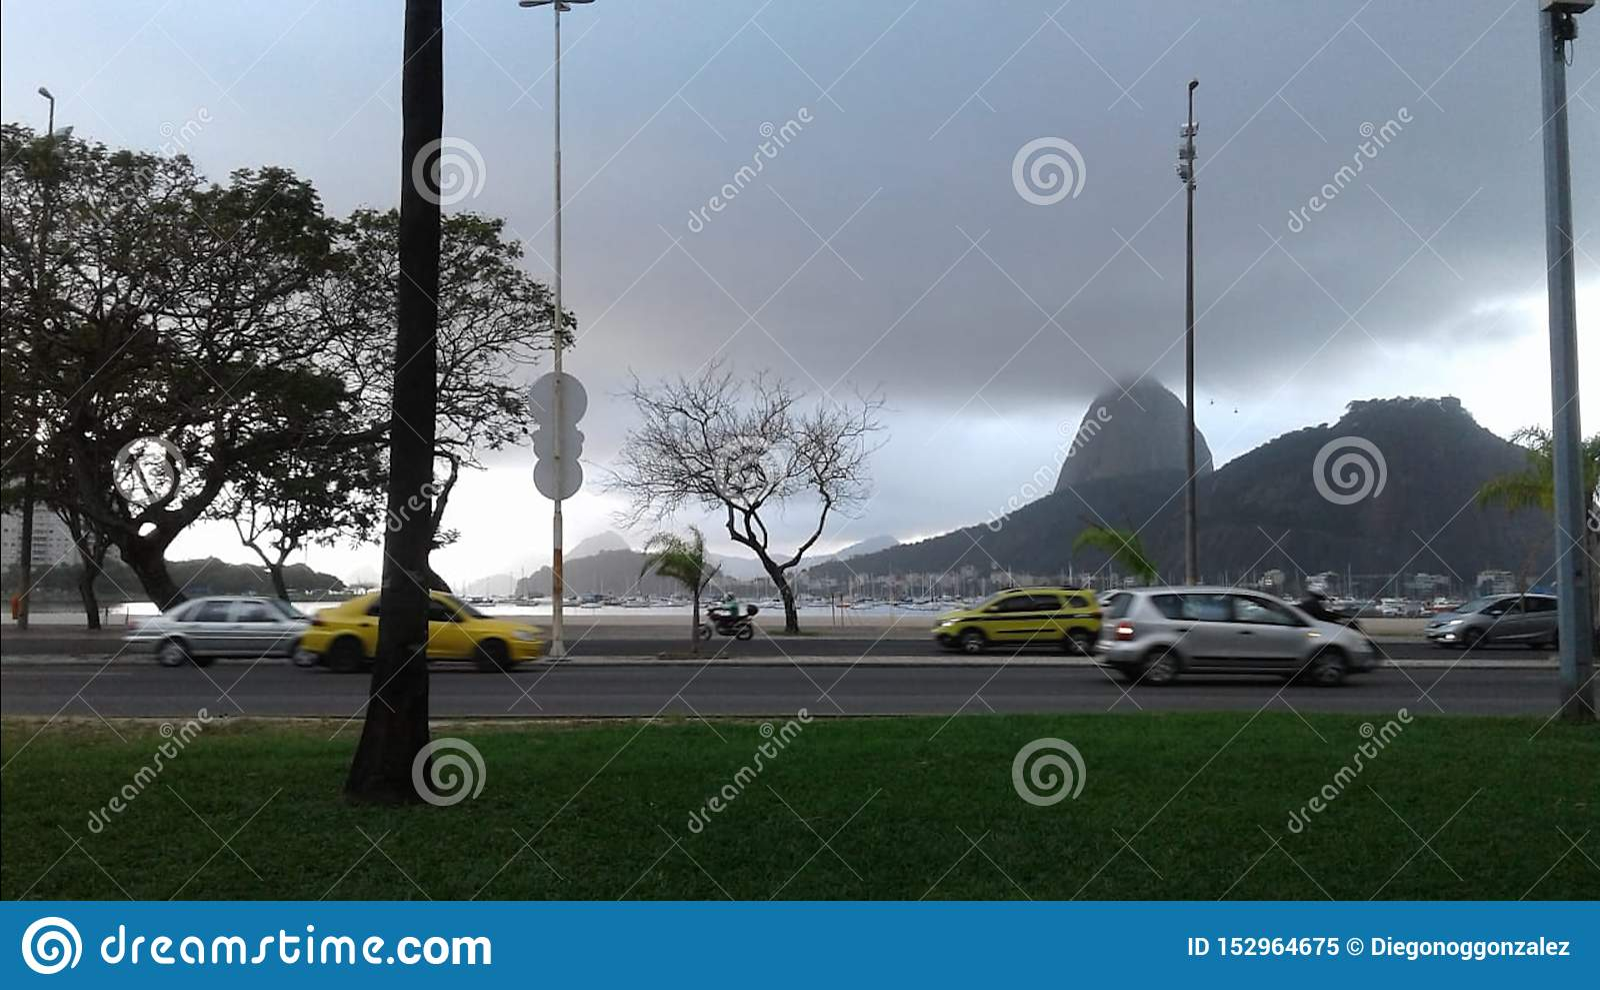 Brazil - Rio de Janeiro - Aterro - Rainy Day - Moutains - Clouds - Cars - Avenue - Dark